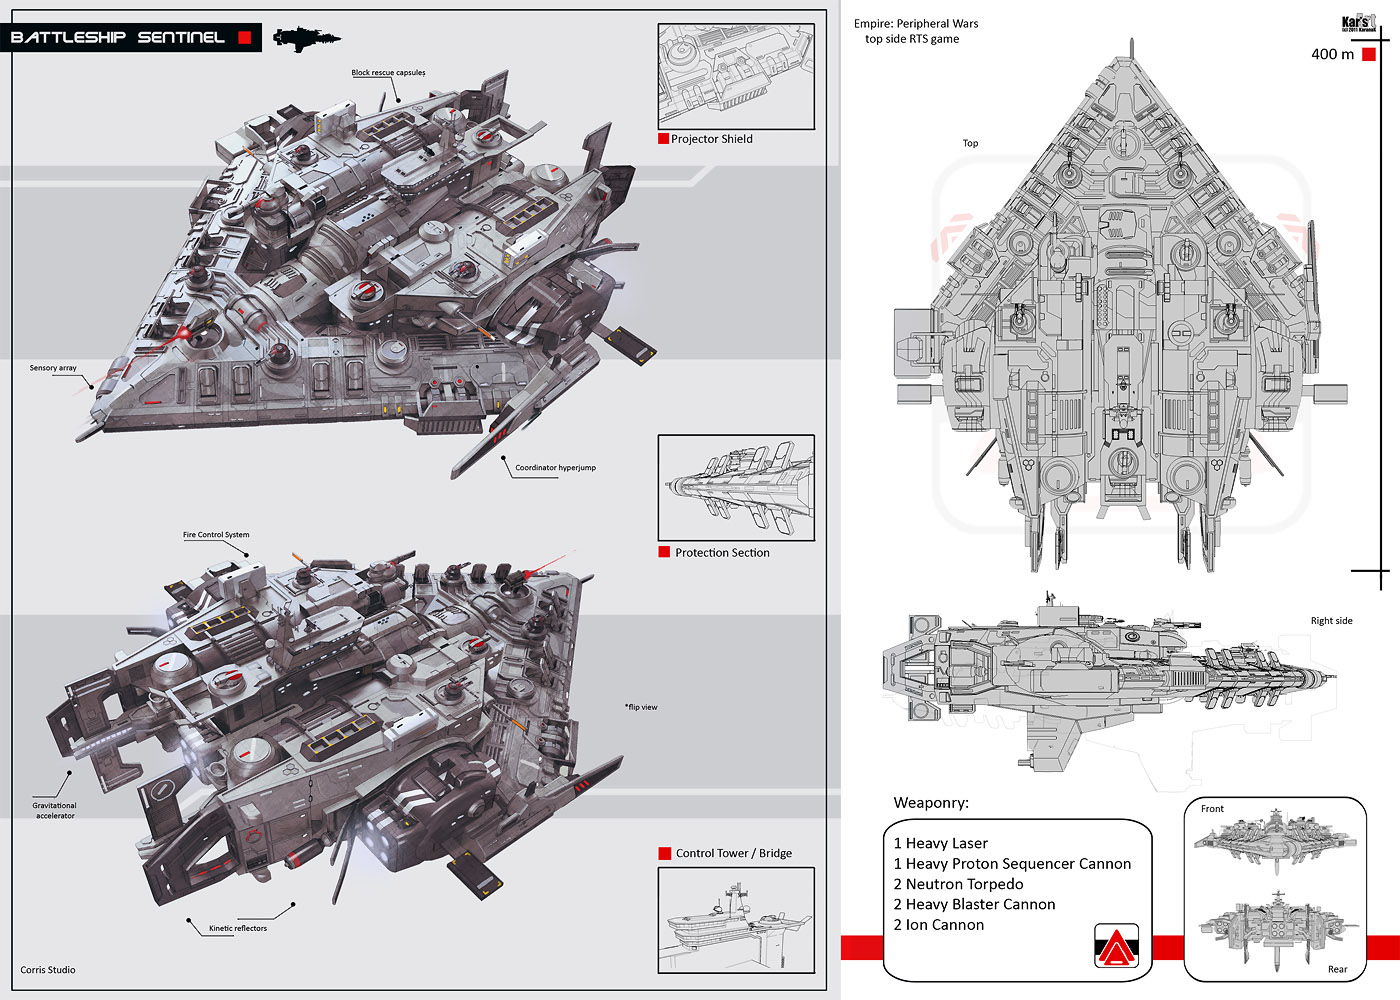 Battleship Sentinel by KaranaK